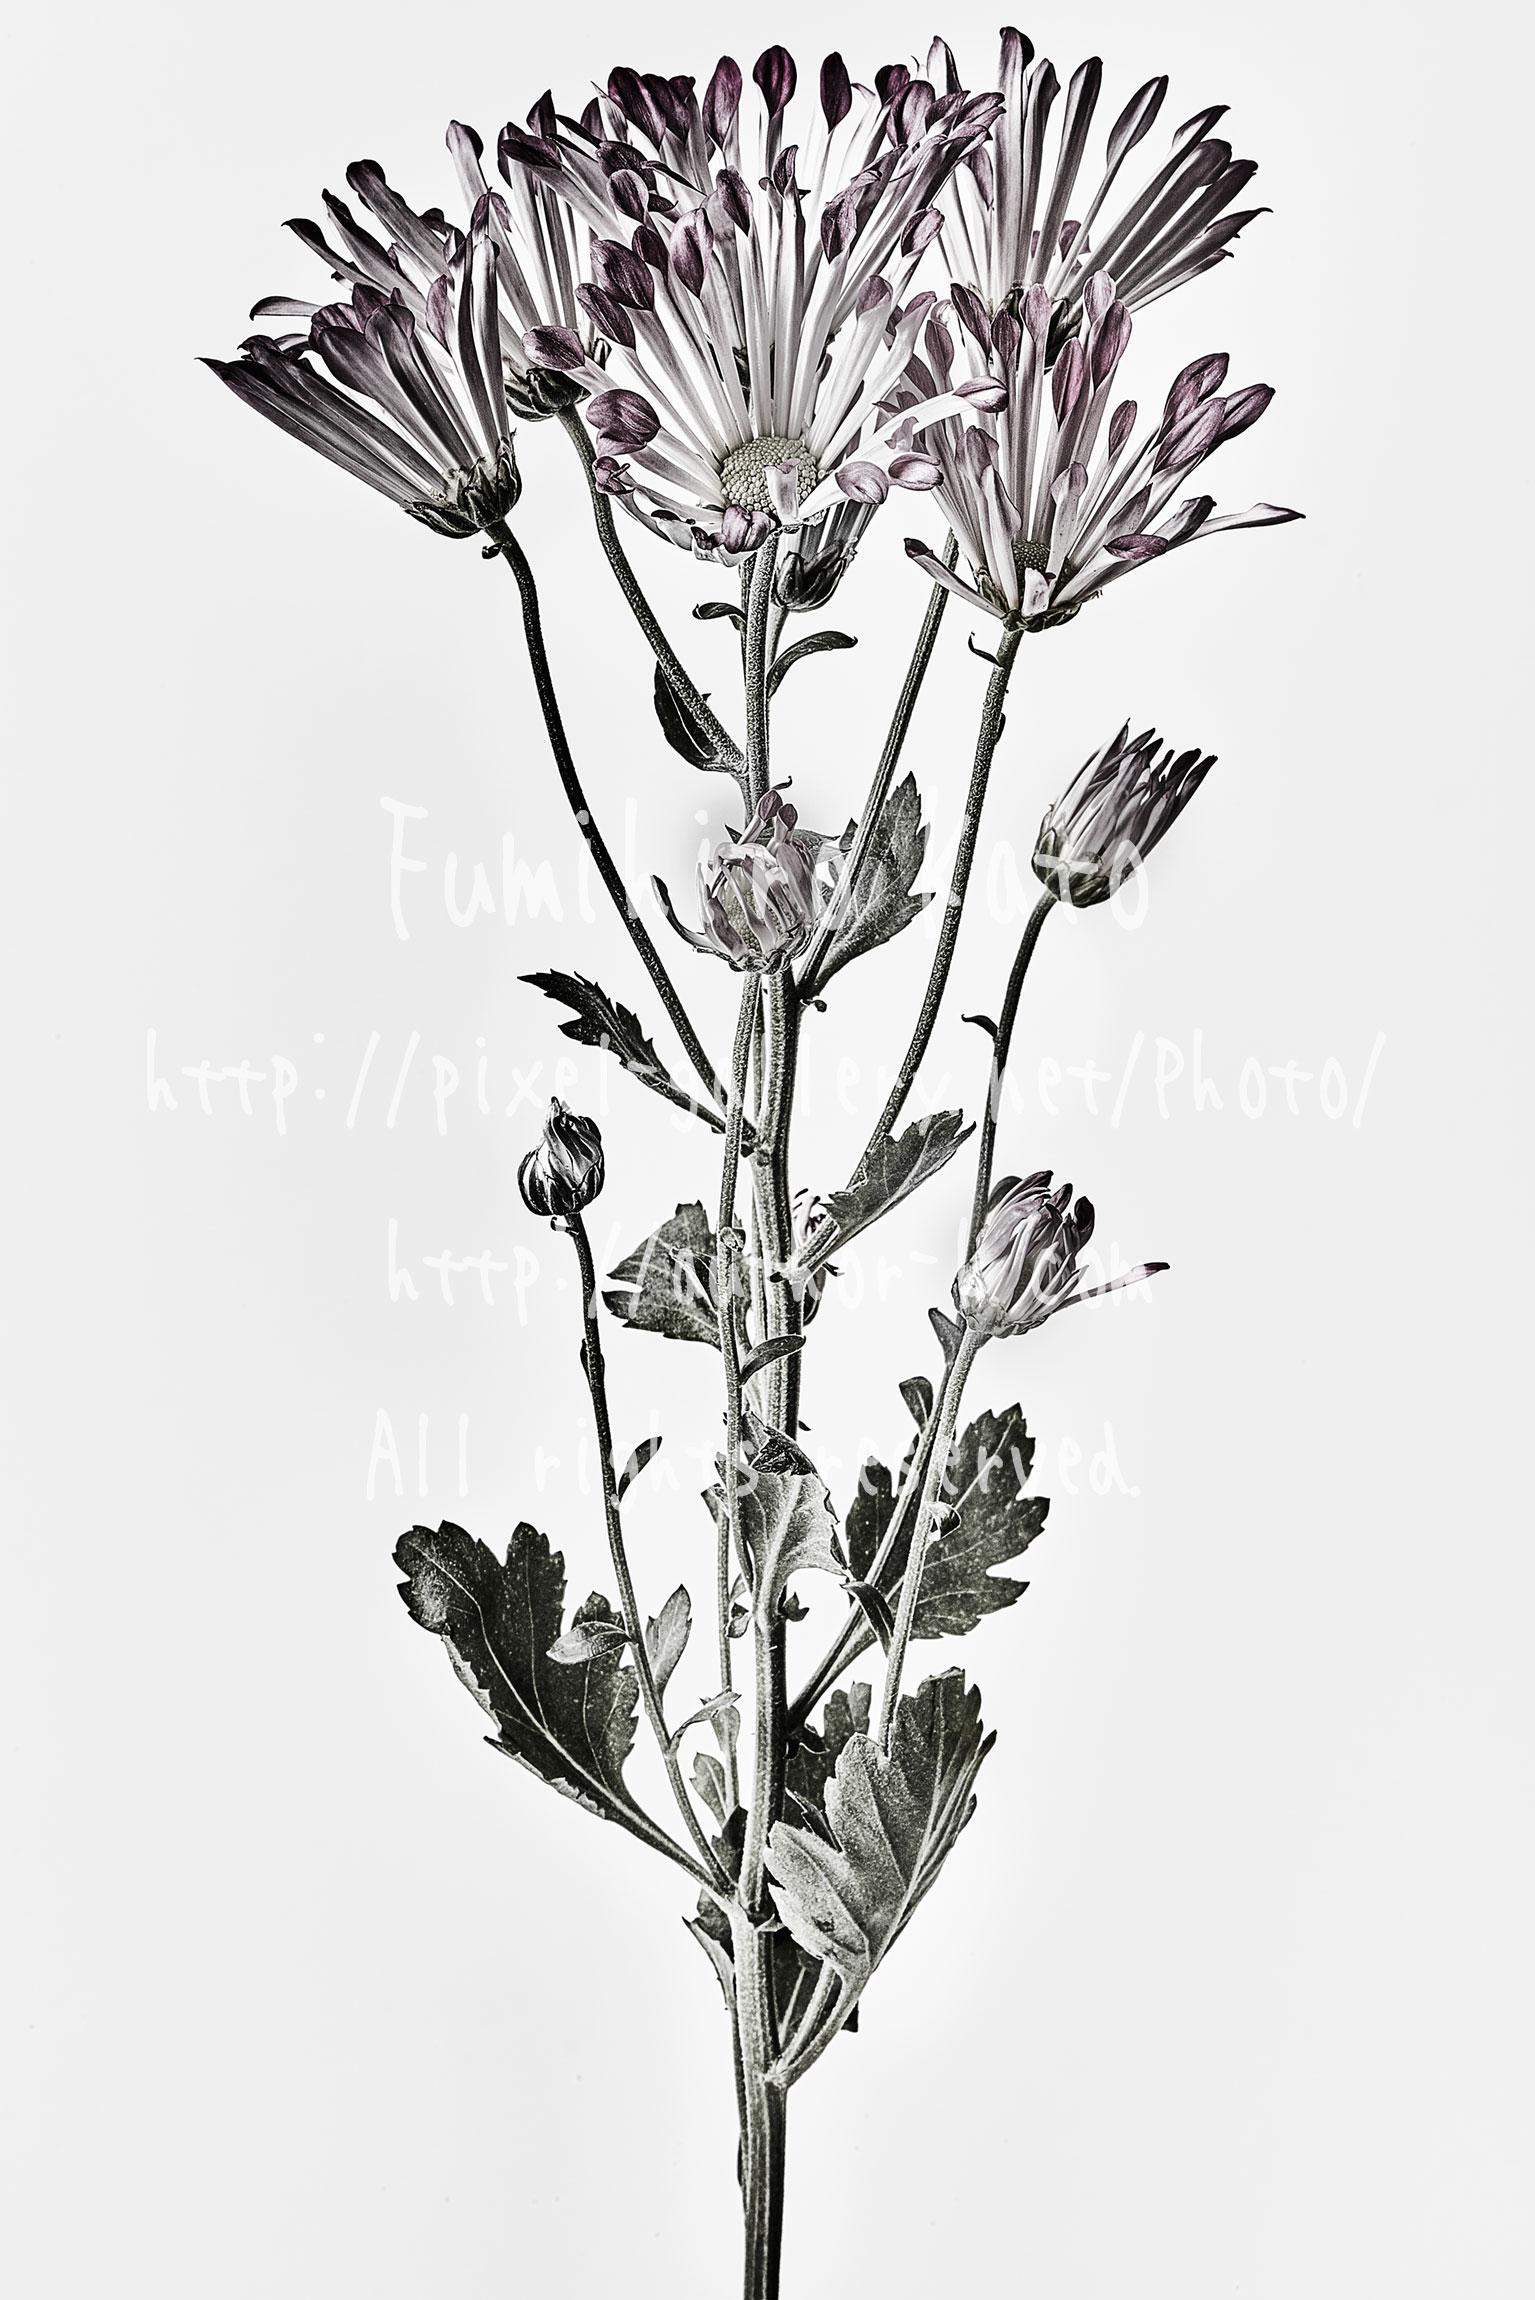 REMIX : 花、彫刻と化す #2015_18517